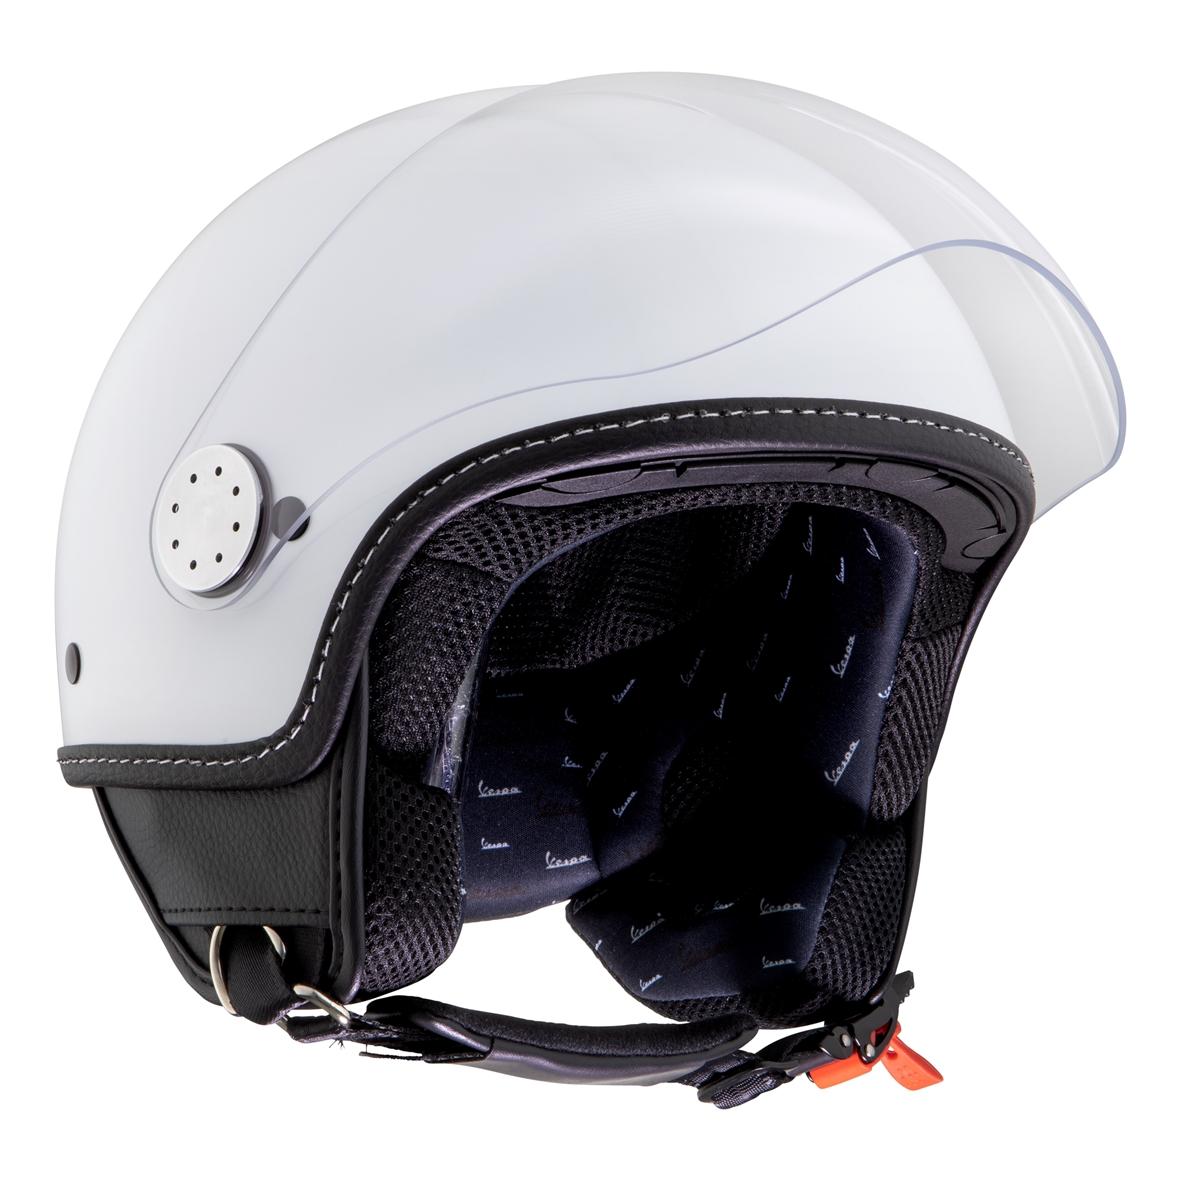 Product Image for 'Helmet PIAGGIO Vespa Visor 3.0Title'